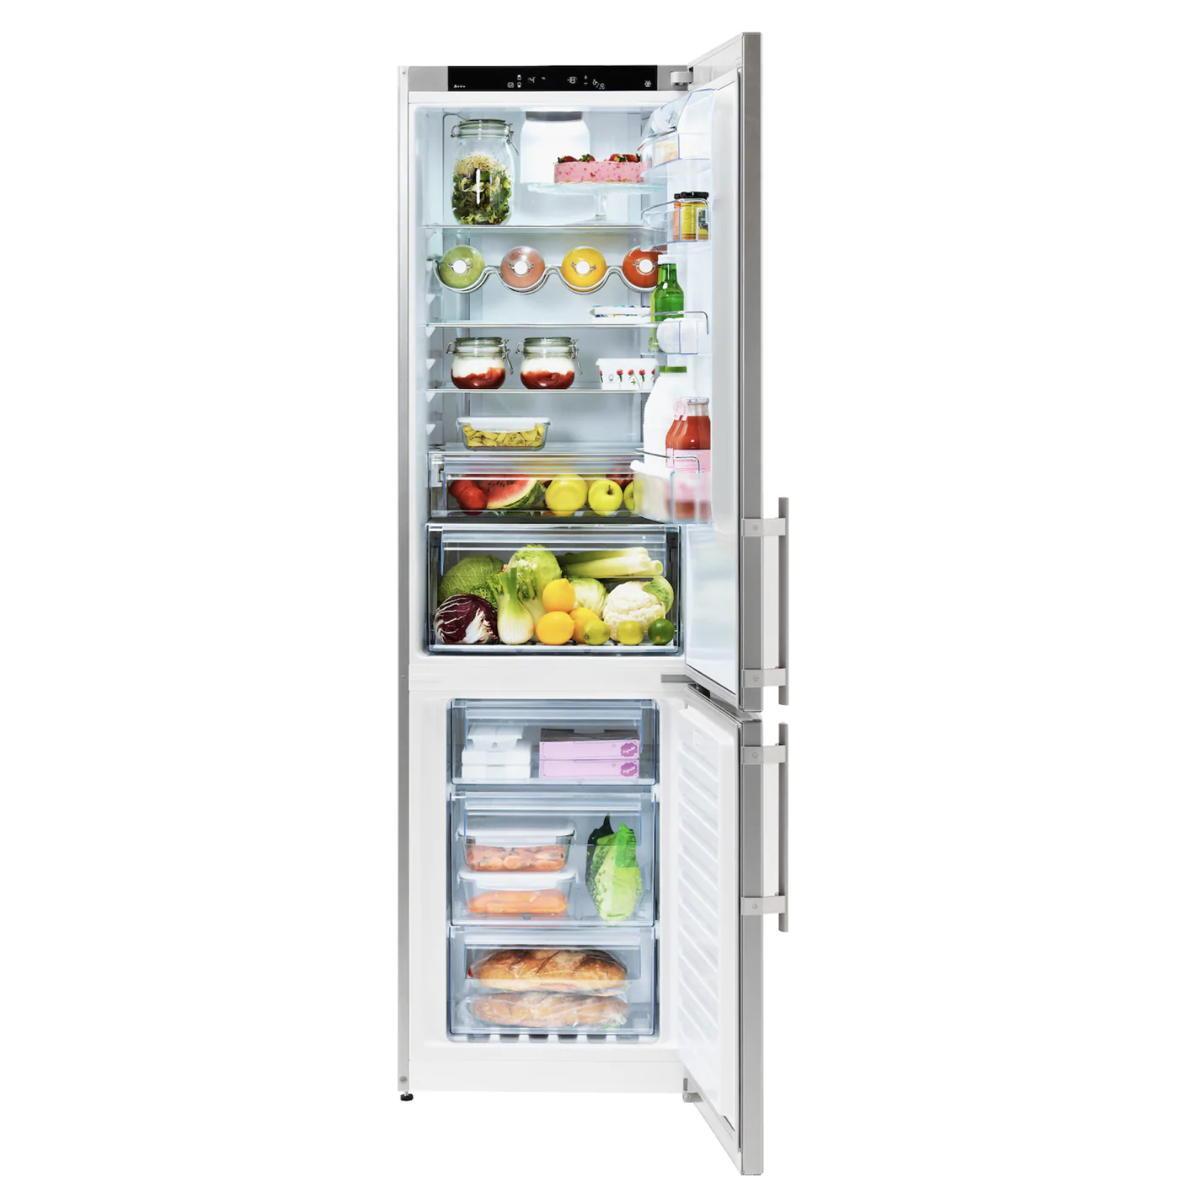 catalogo-novita-elettrodomestici-ikea-2020-frigorifero-esterno-frostkall